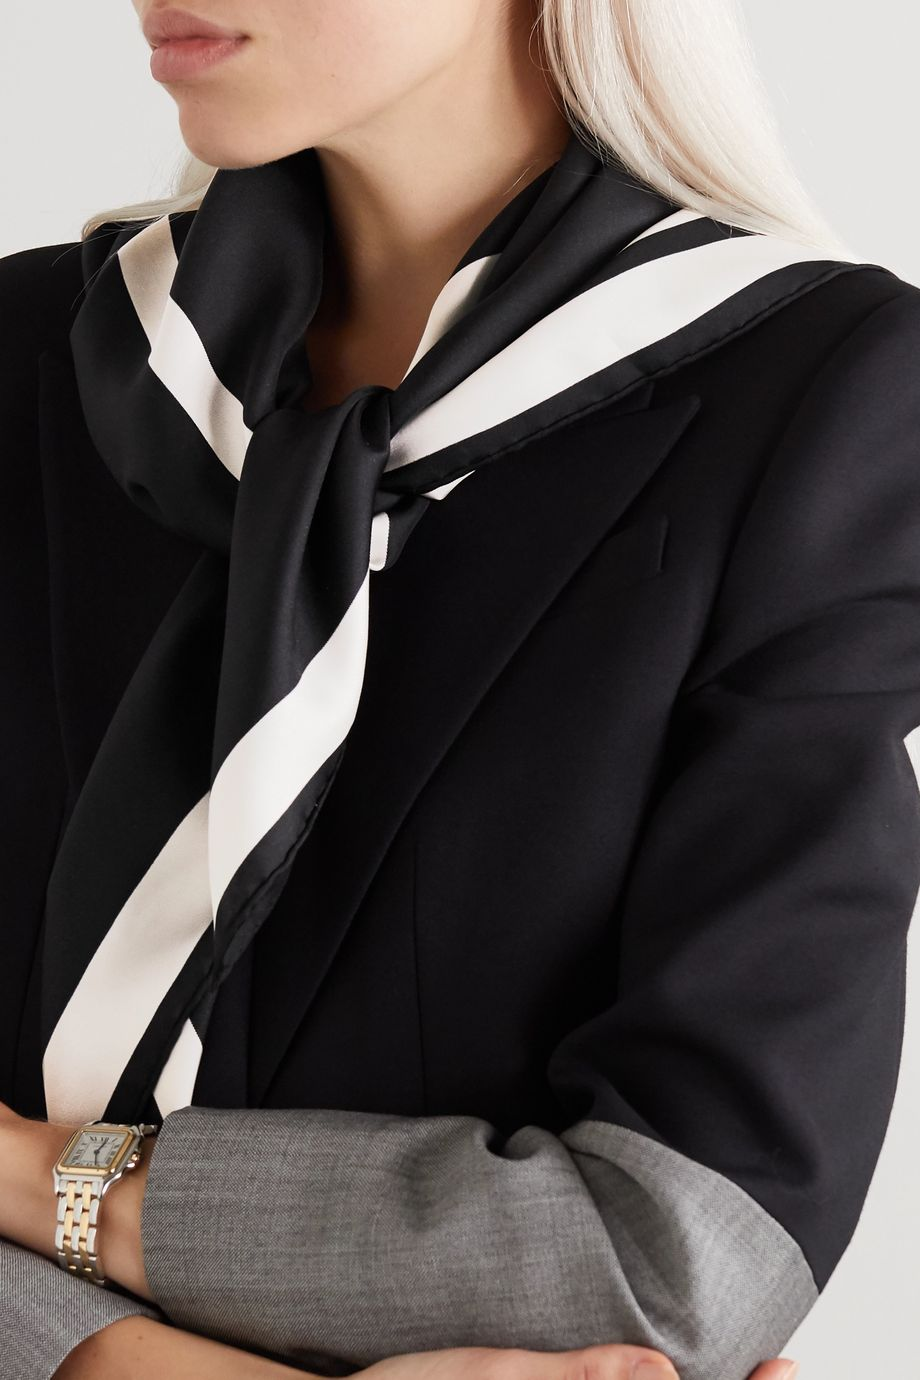 Valentino Valentino Garavani 印花真丝斜纹布围巾